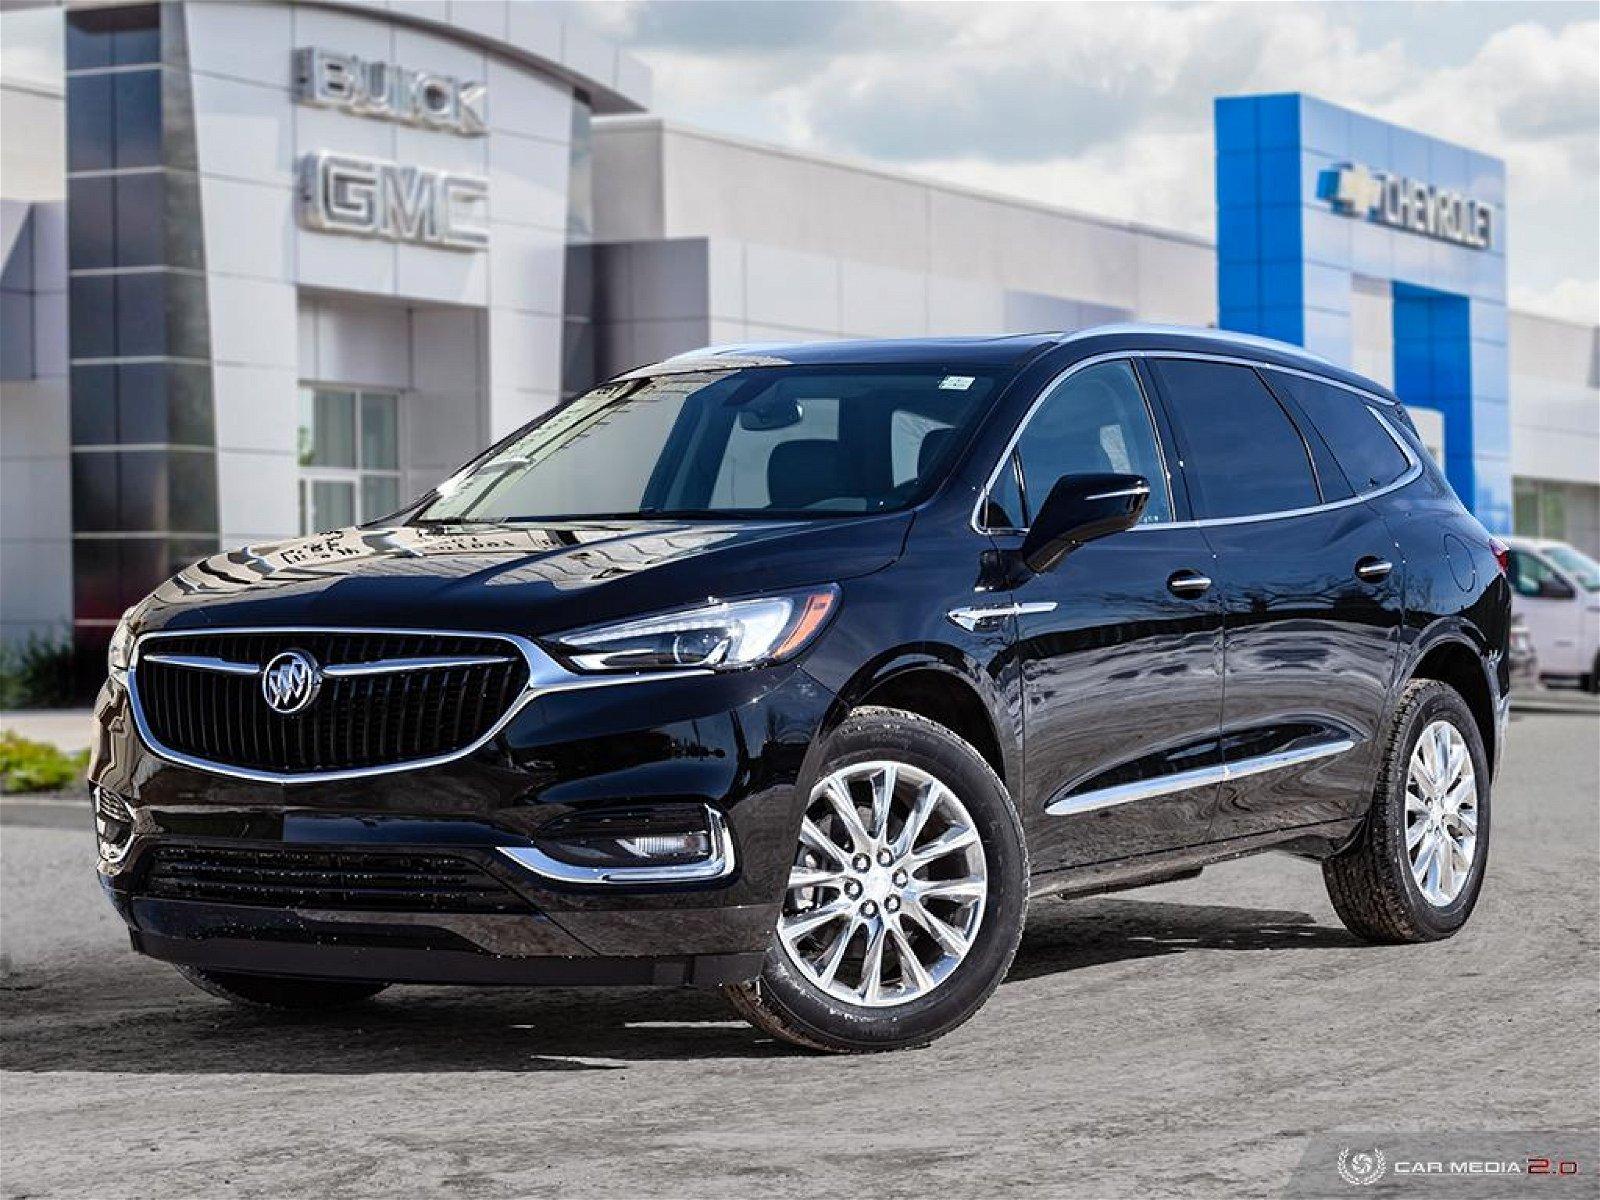 2019 Buick Enclave Essence AWD, stock no. G19609 ...